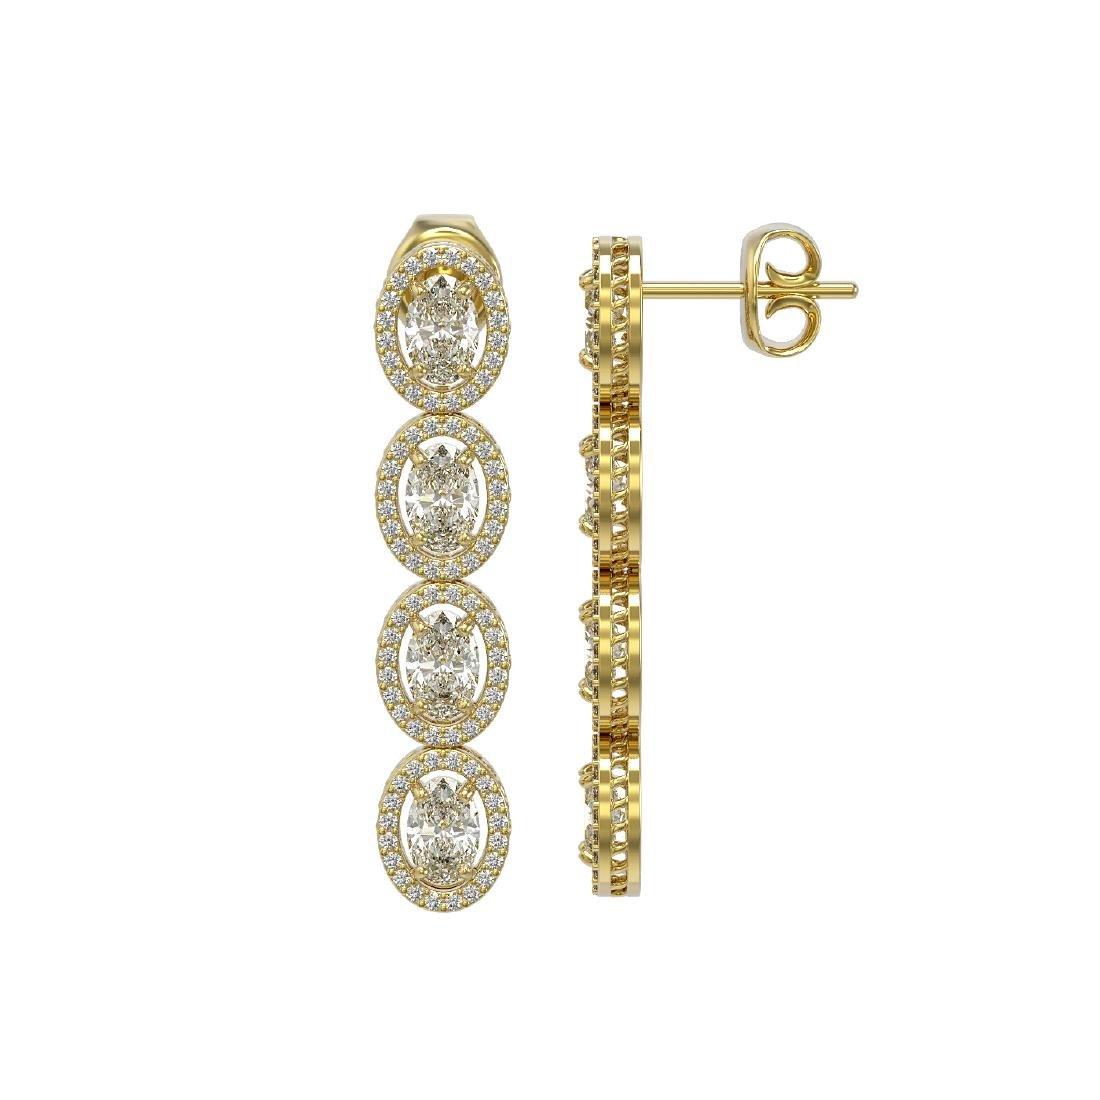 6.08 CTW Oval Diamond Designer Earrings 18K Yellow Gold - 2